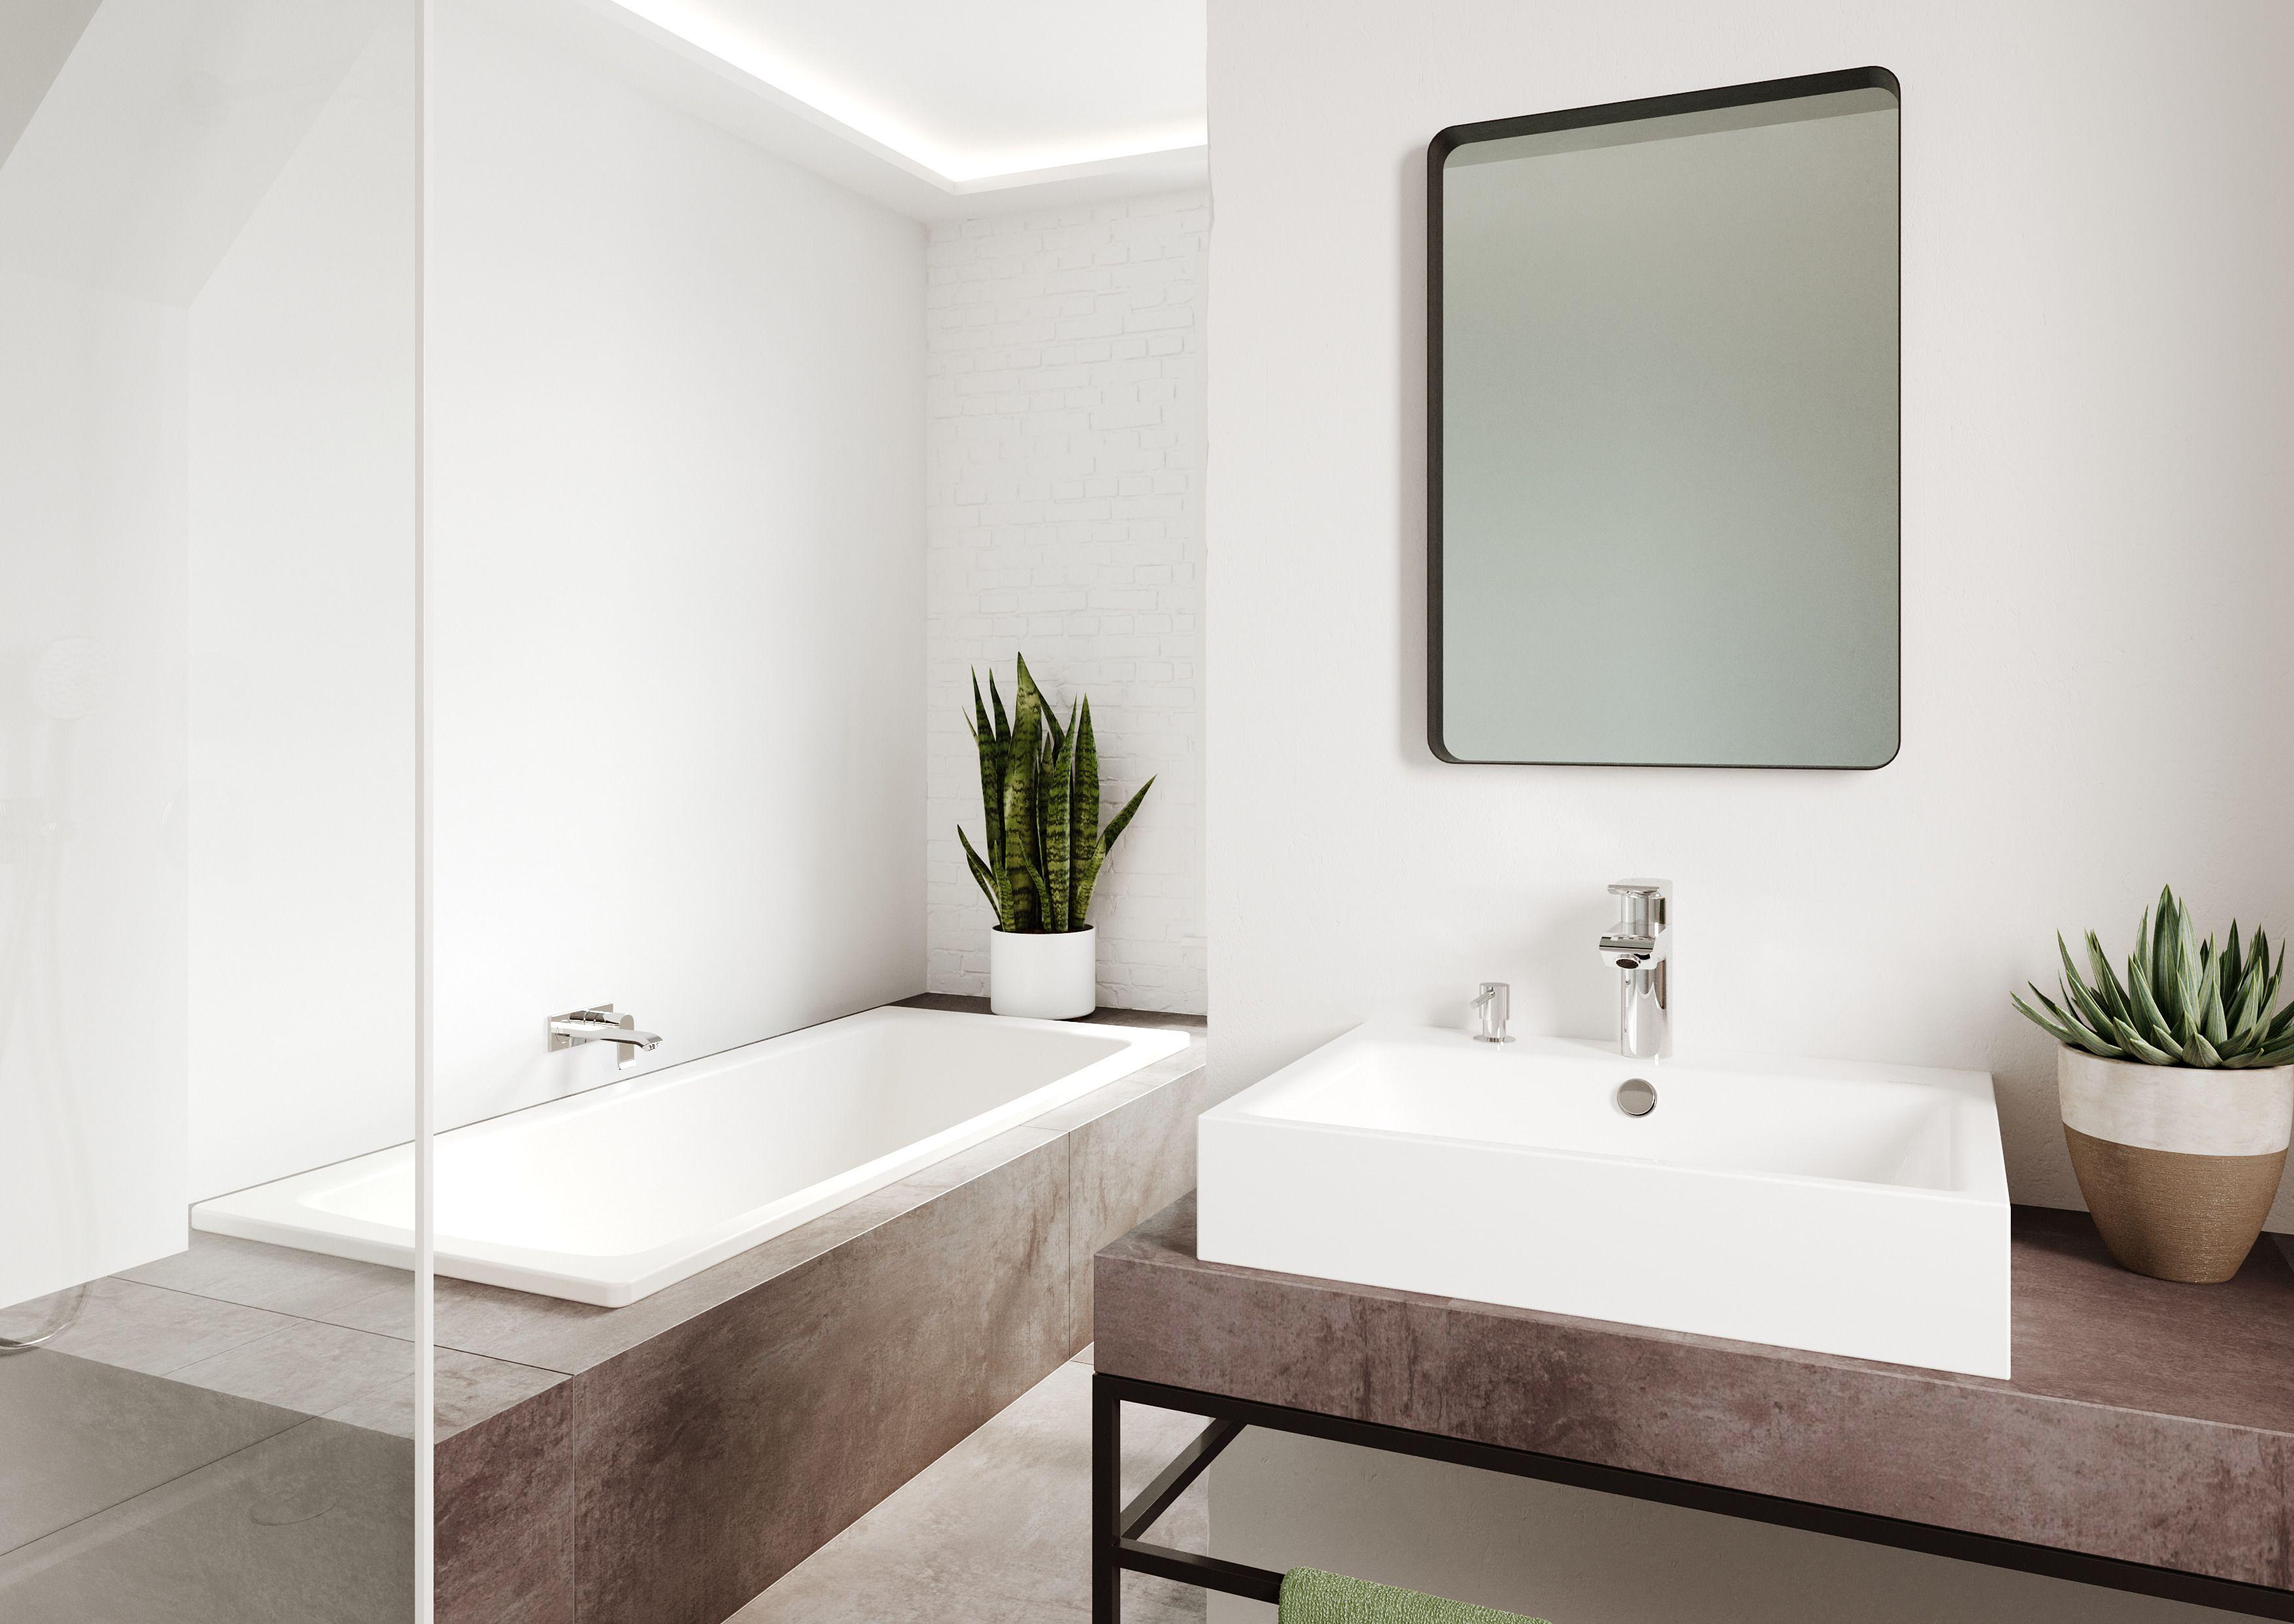 Pin By Kaldewei On Kaldewei Dream Bathrooms Traumbader Dream Bathrooms Modern Architecture Design